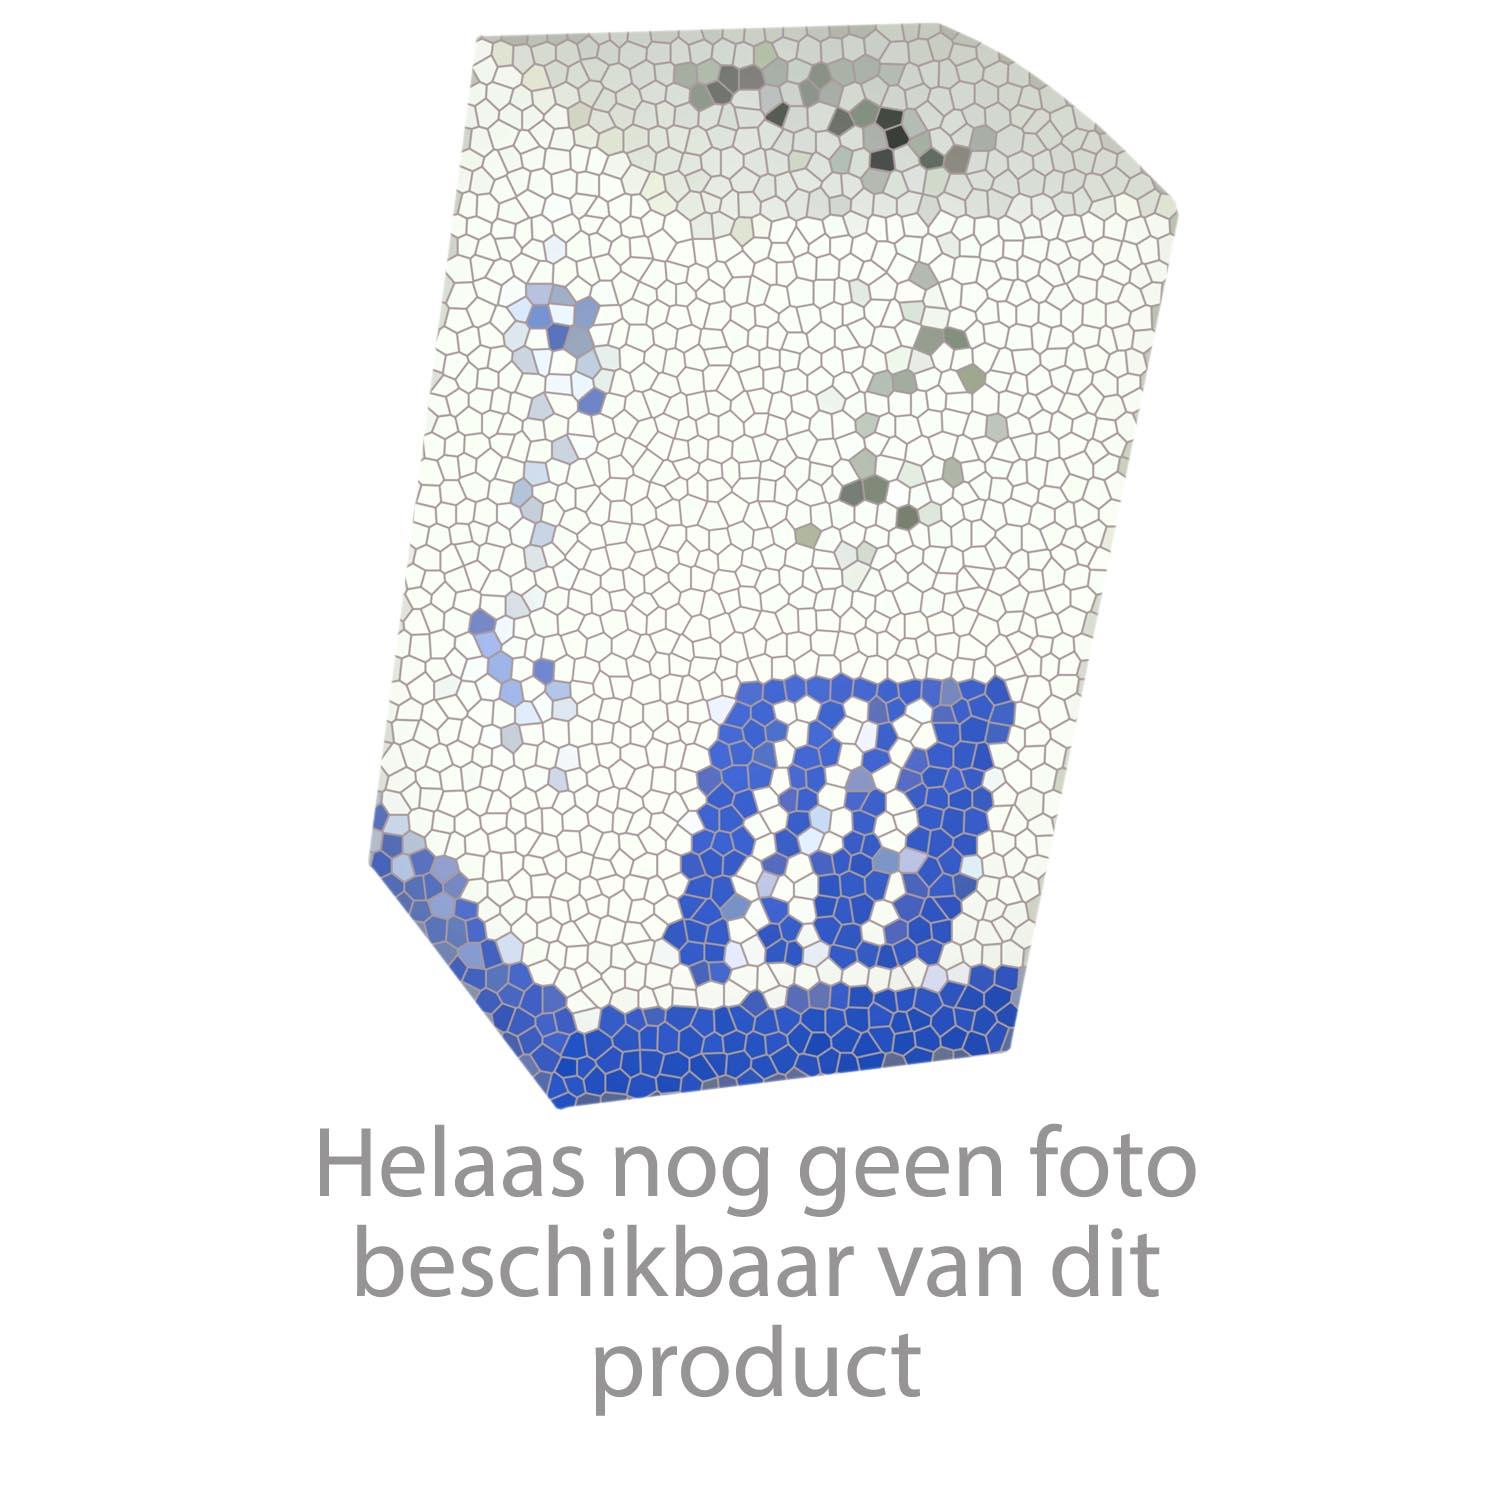 Grohe onderdelen Allure Brilliant Wastafelmengkraan (Vloermontage) 23116000